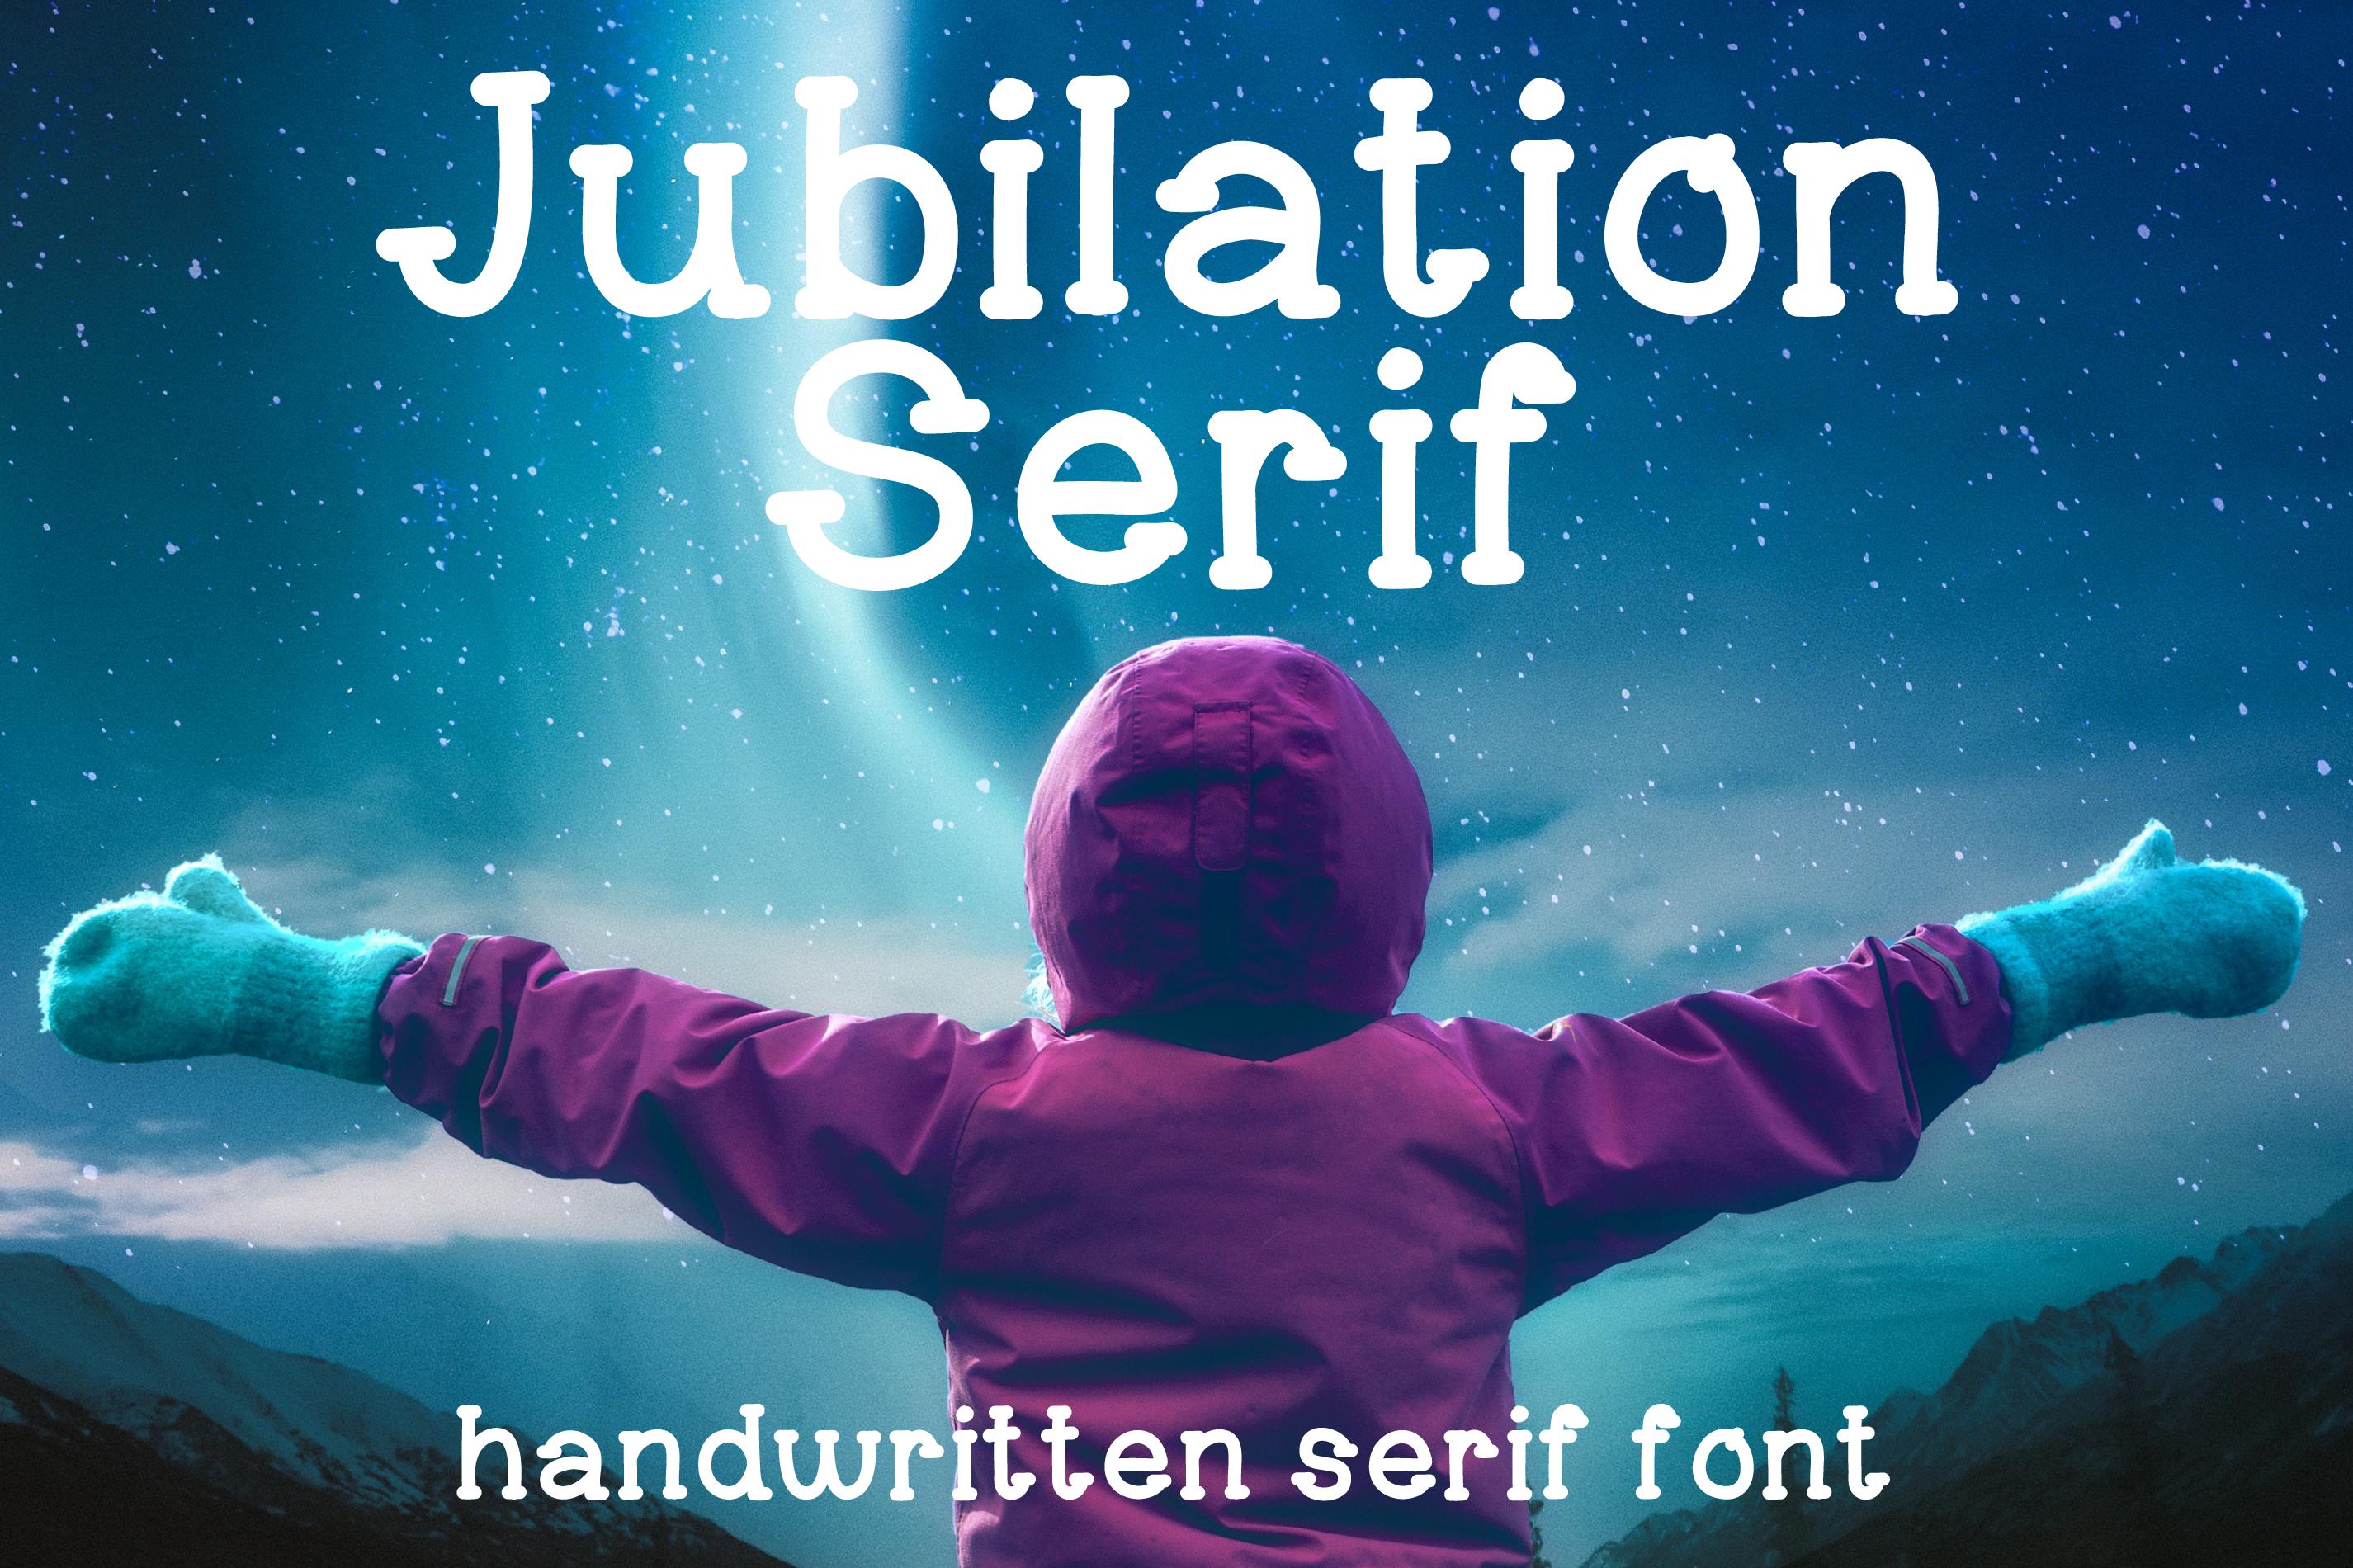 Jubilation Serif Handwritten Font example image 1